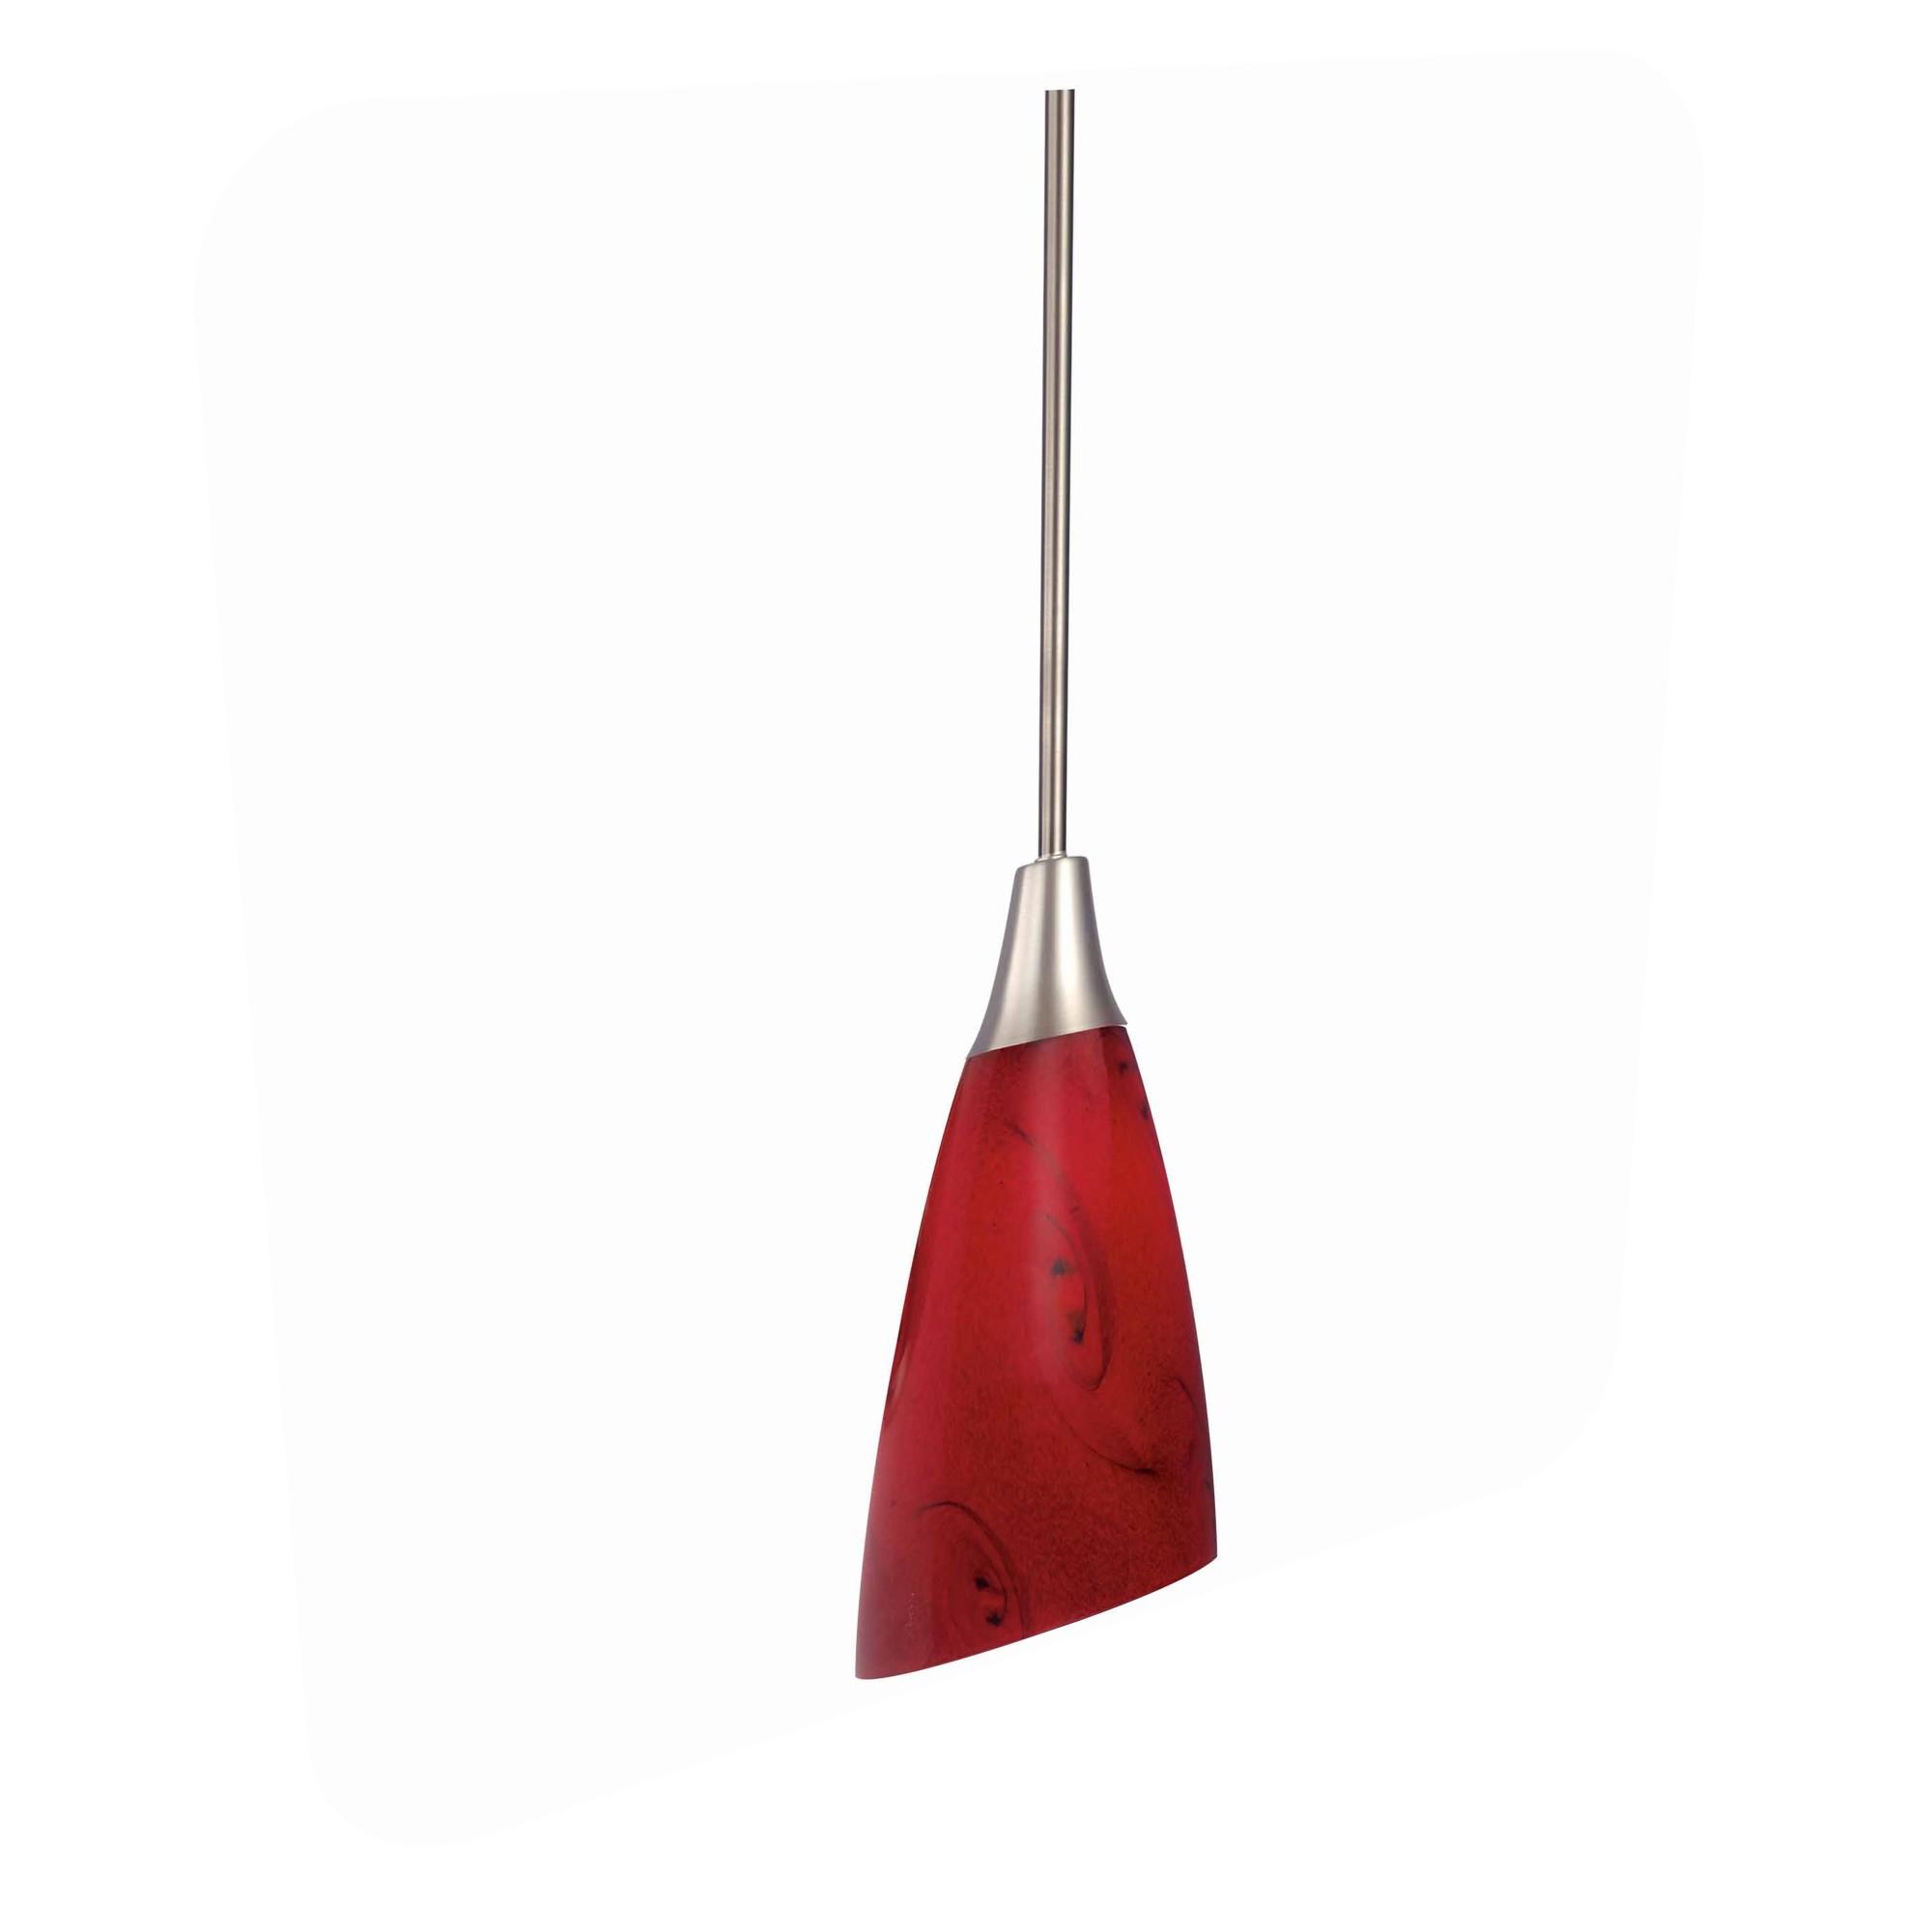 interior lighting manufacturers modern contemporary red stylish light pendant lighting in kitchen design copper pendant lighting mini pendant lighting ideas